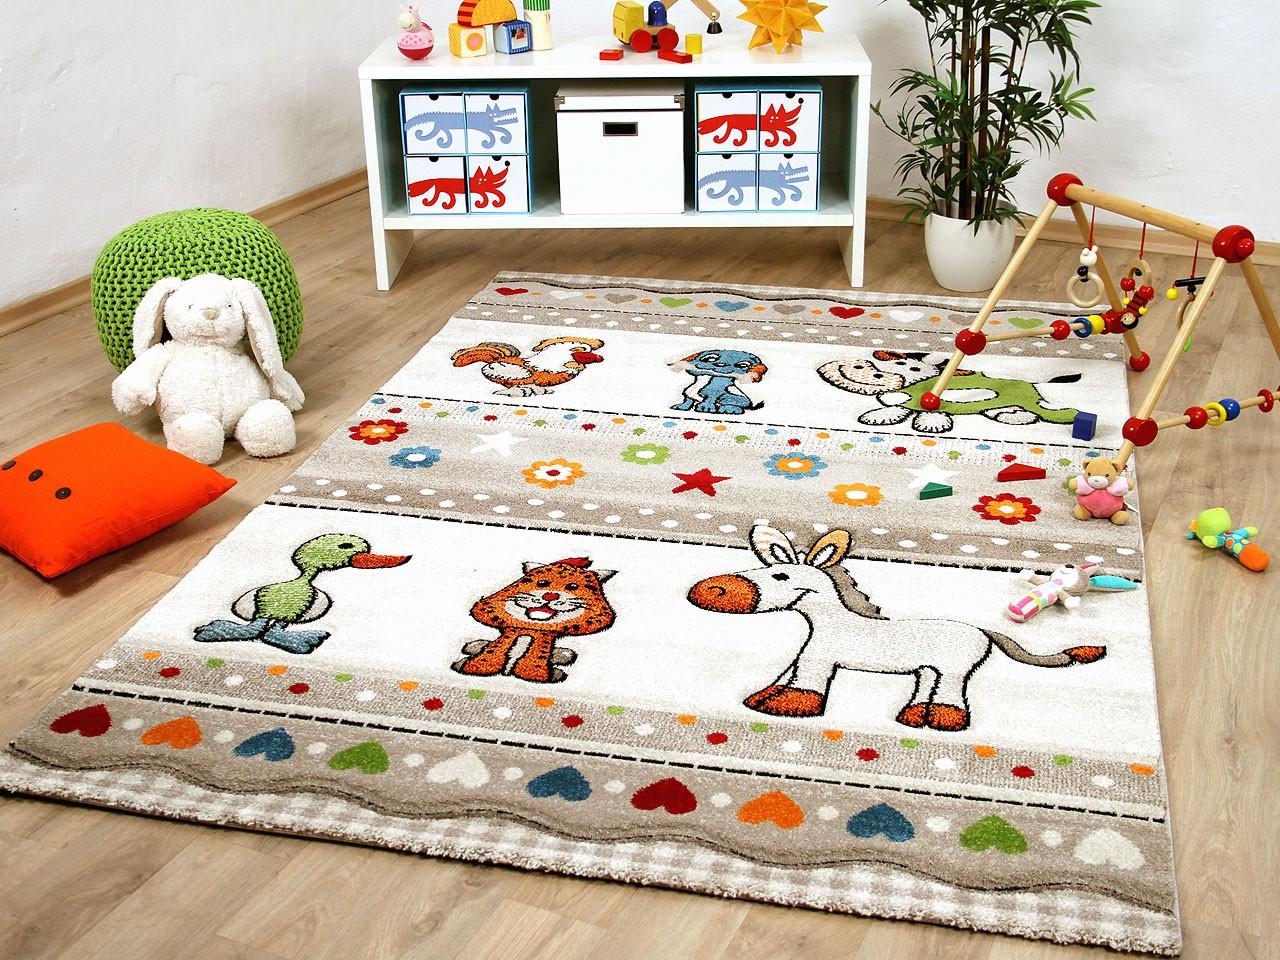 Full Size of Teppiche Kinderzimmer Regale Regal Weiß Wohnzimmer Sofa Kinderzimmer Teppiche Kinderzimmer